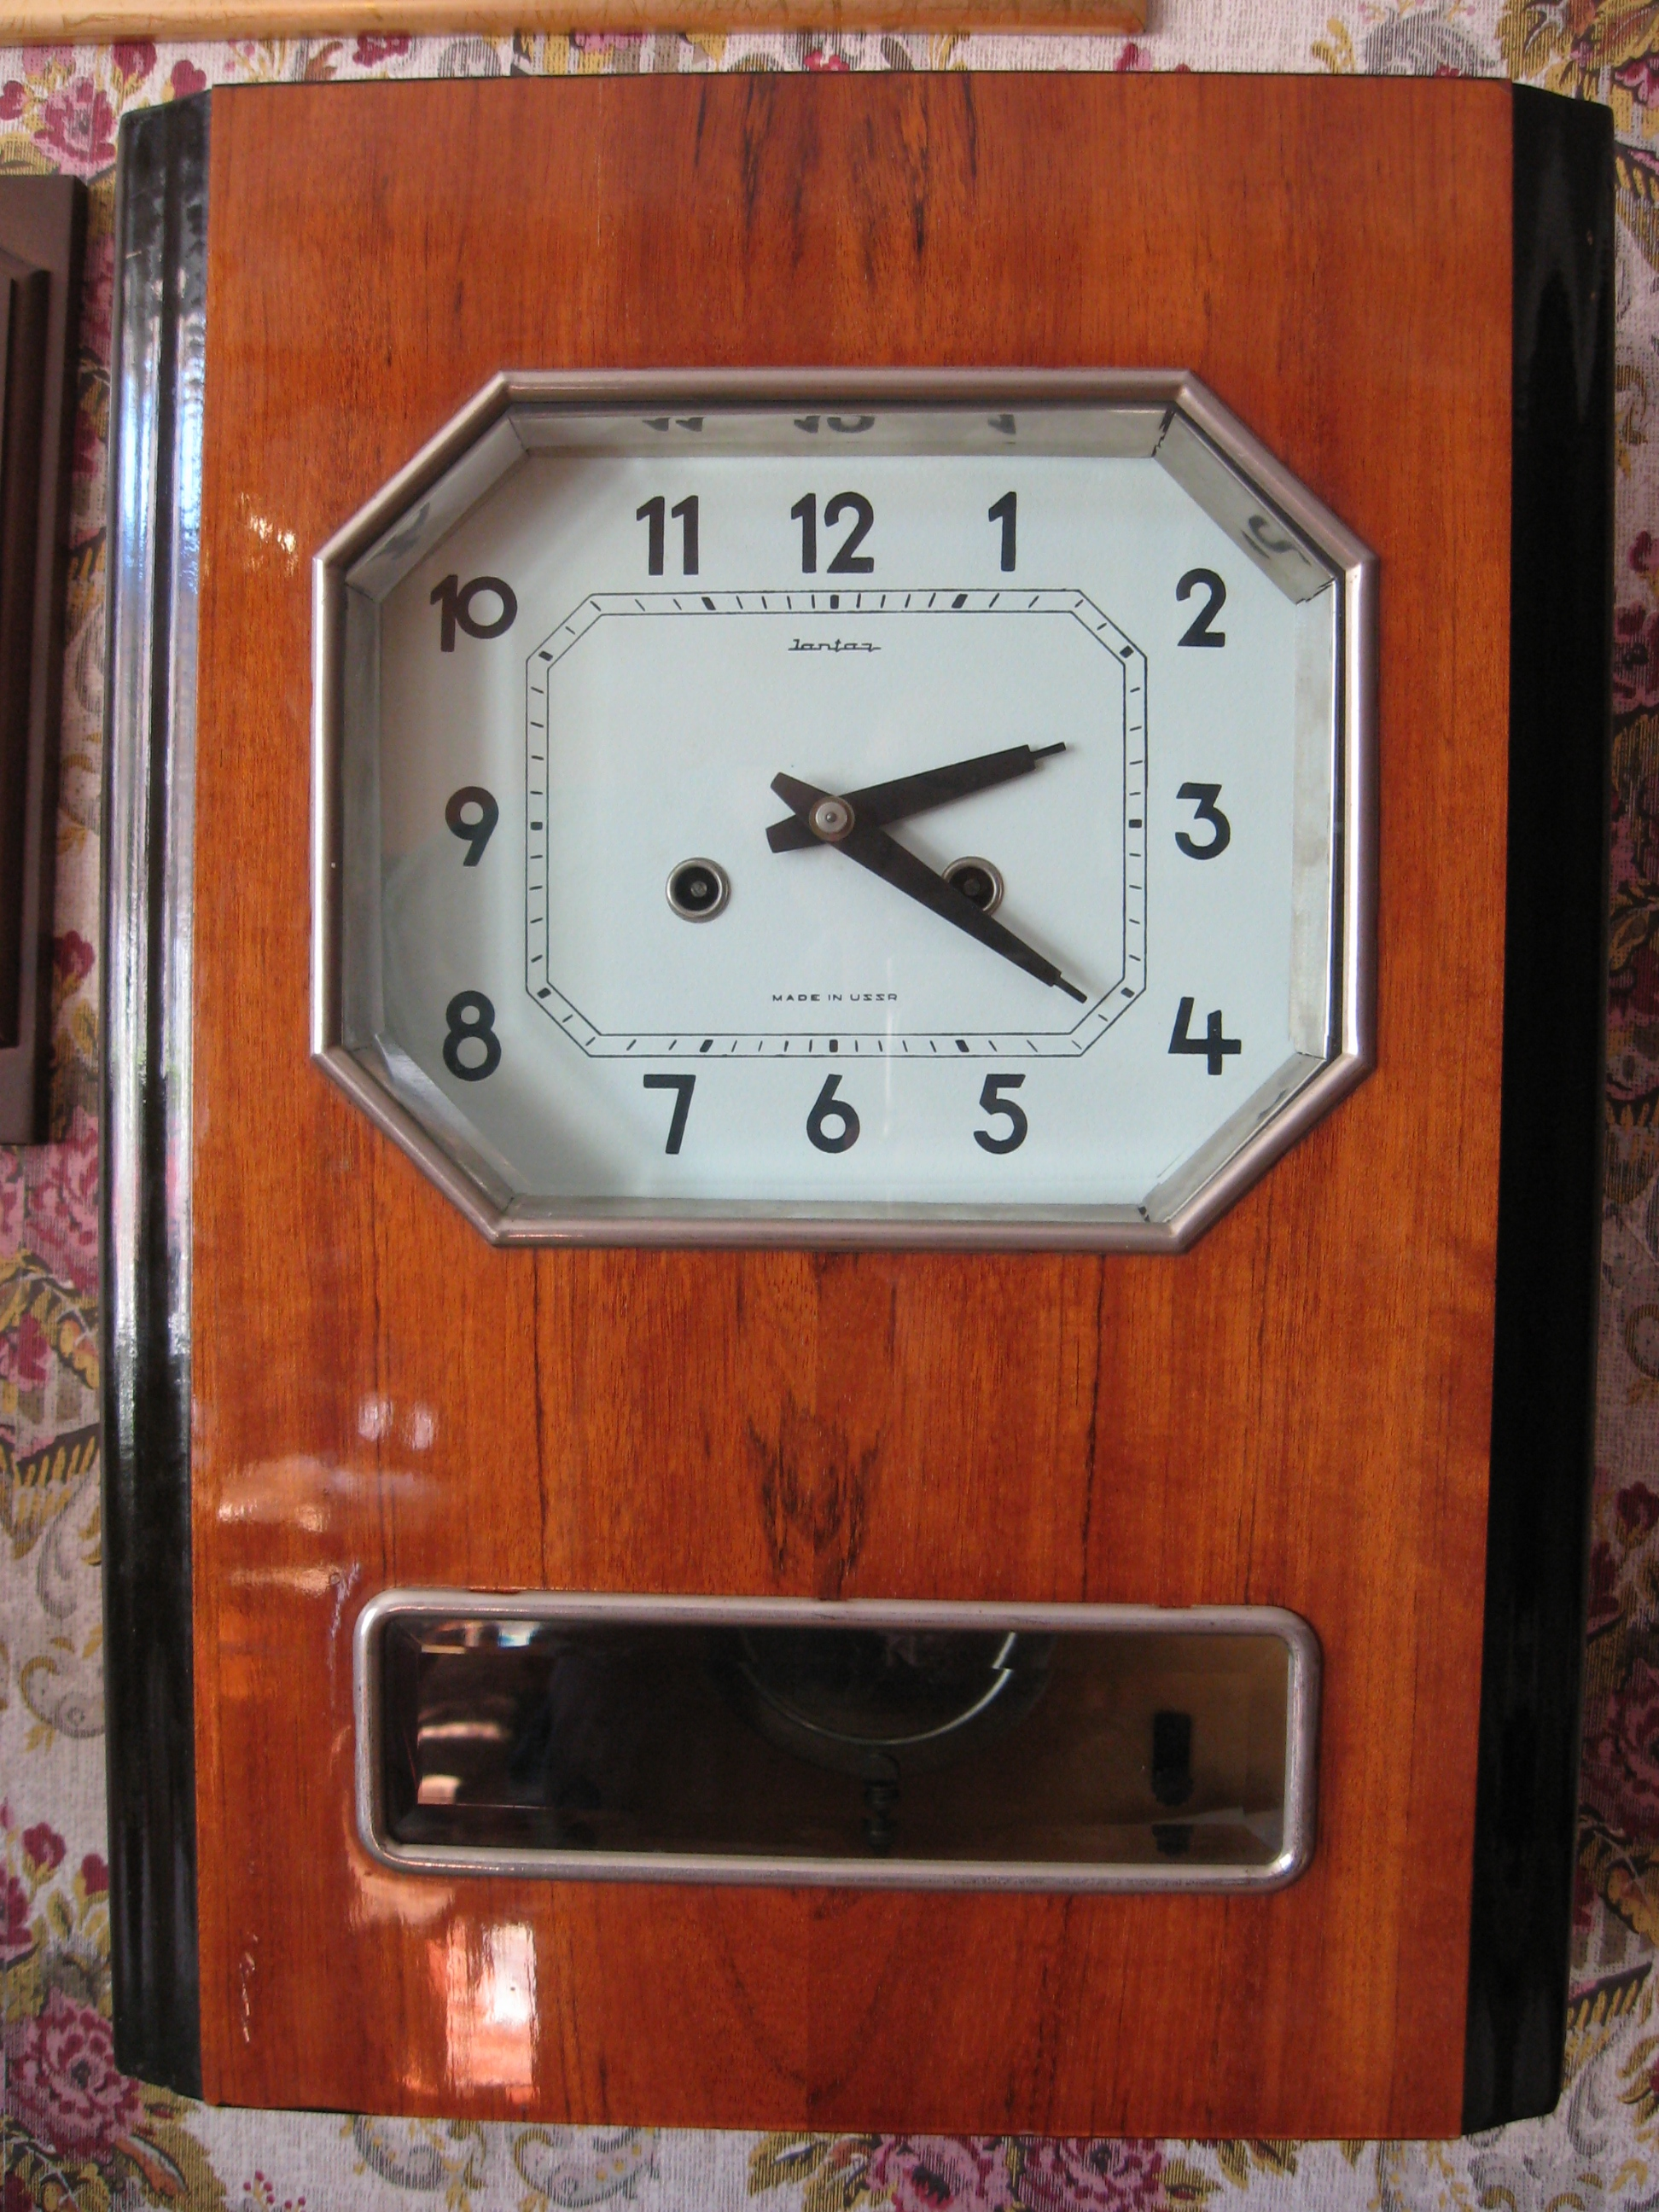 Filewall clock jantar ussr 1978g wikimedia commons filewall clock jantar ussr 1978g amipublicfo Images